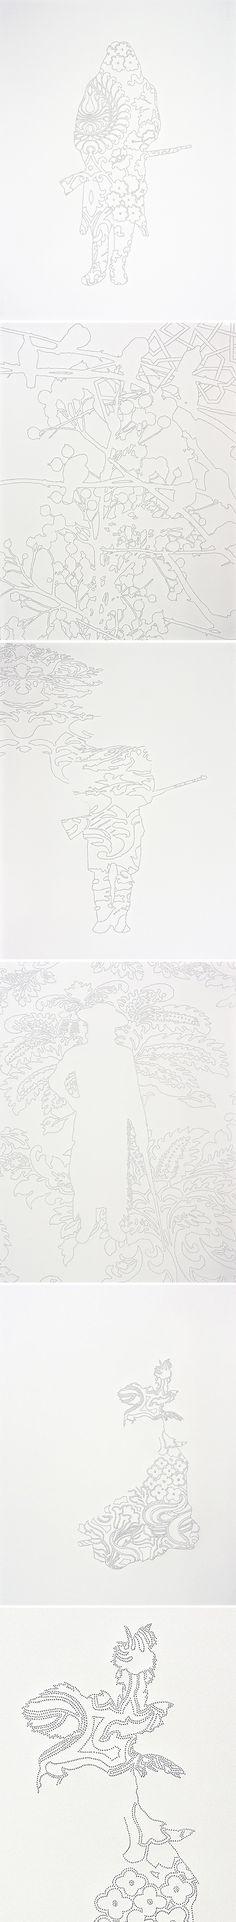 wendy kawabata (handmade sewing needle perforations through paper) <3